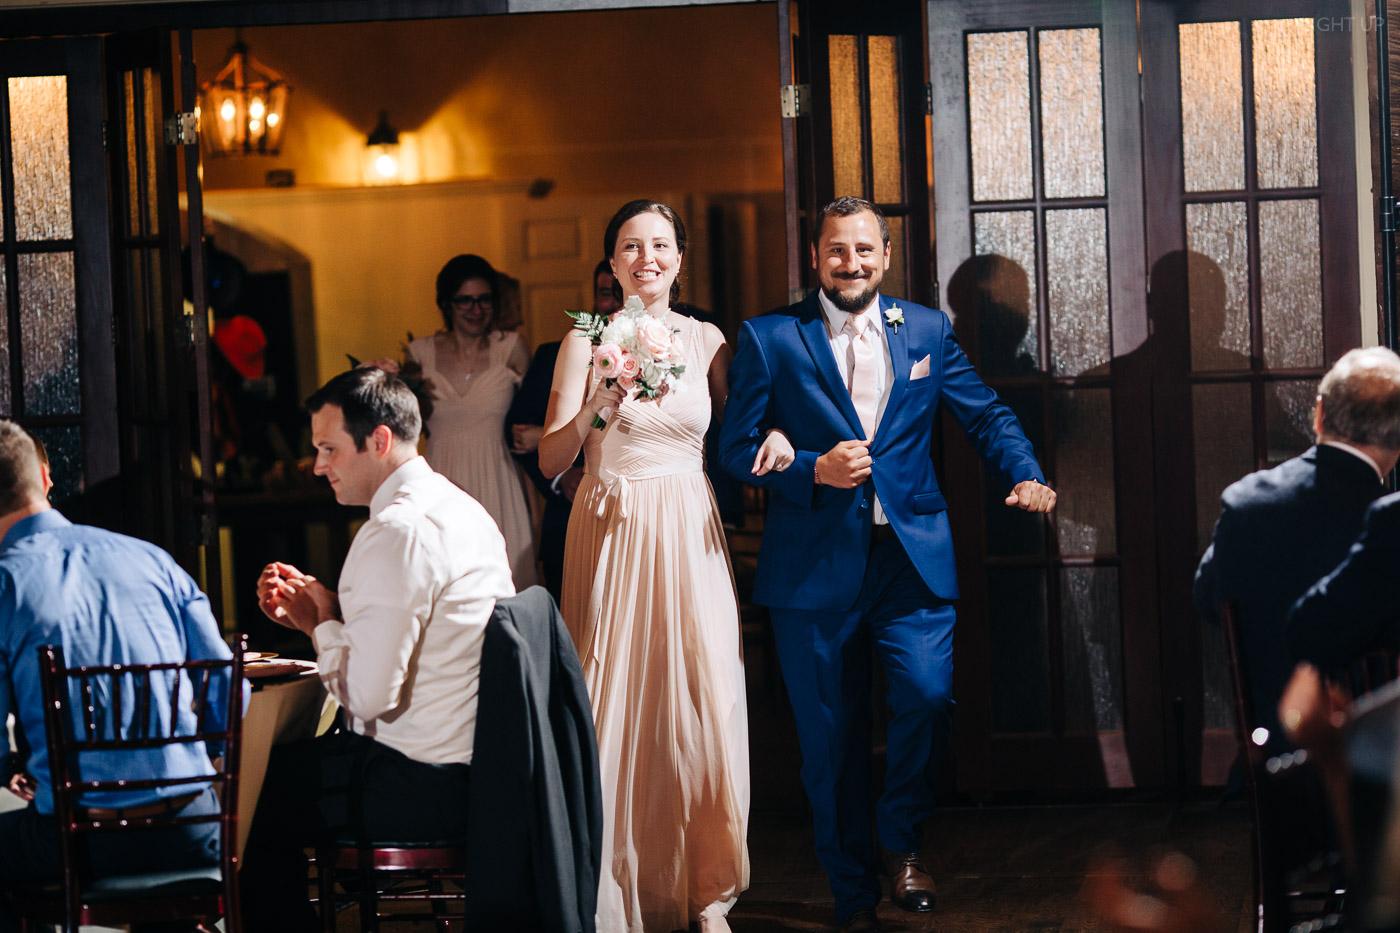 hstoric-dubsdread-wedding-orlando-40.jpg